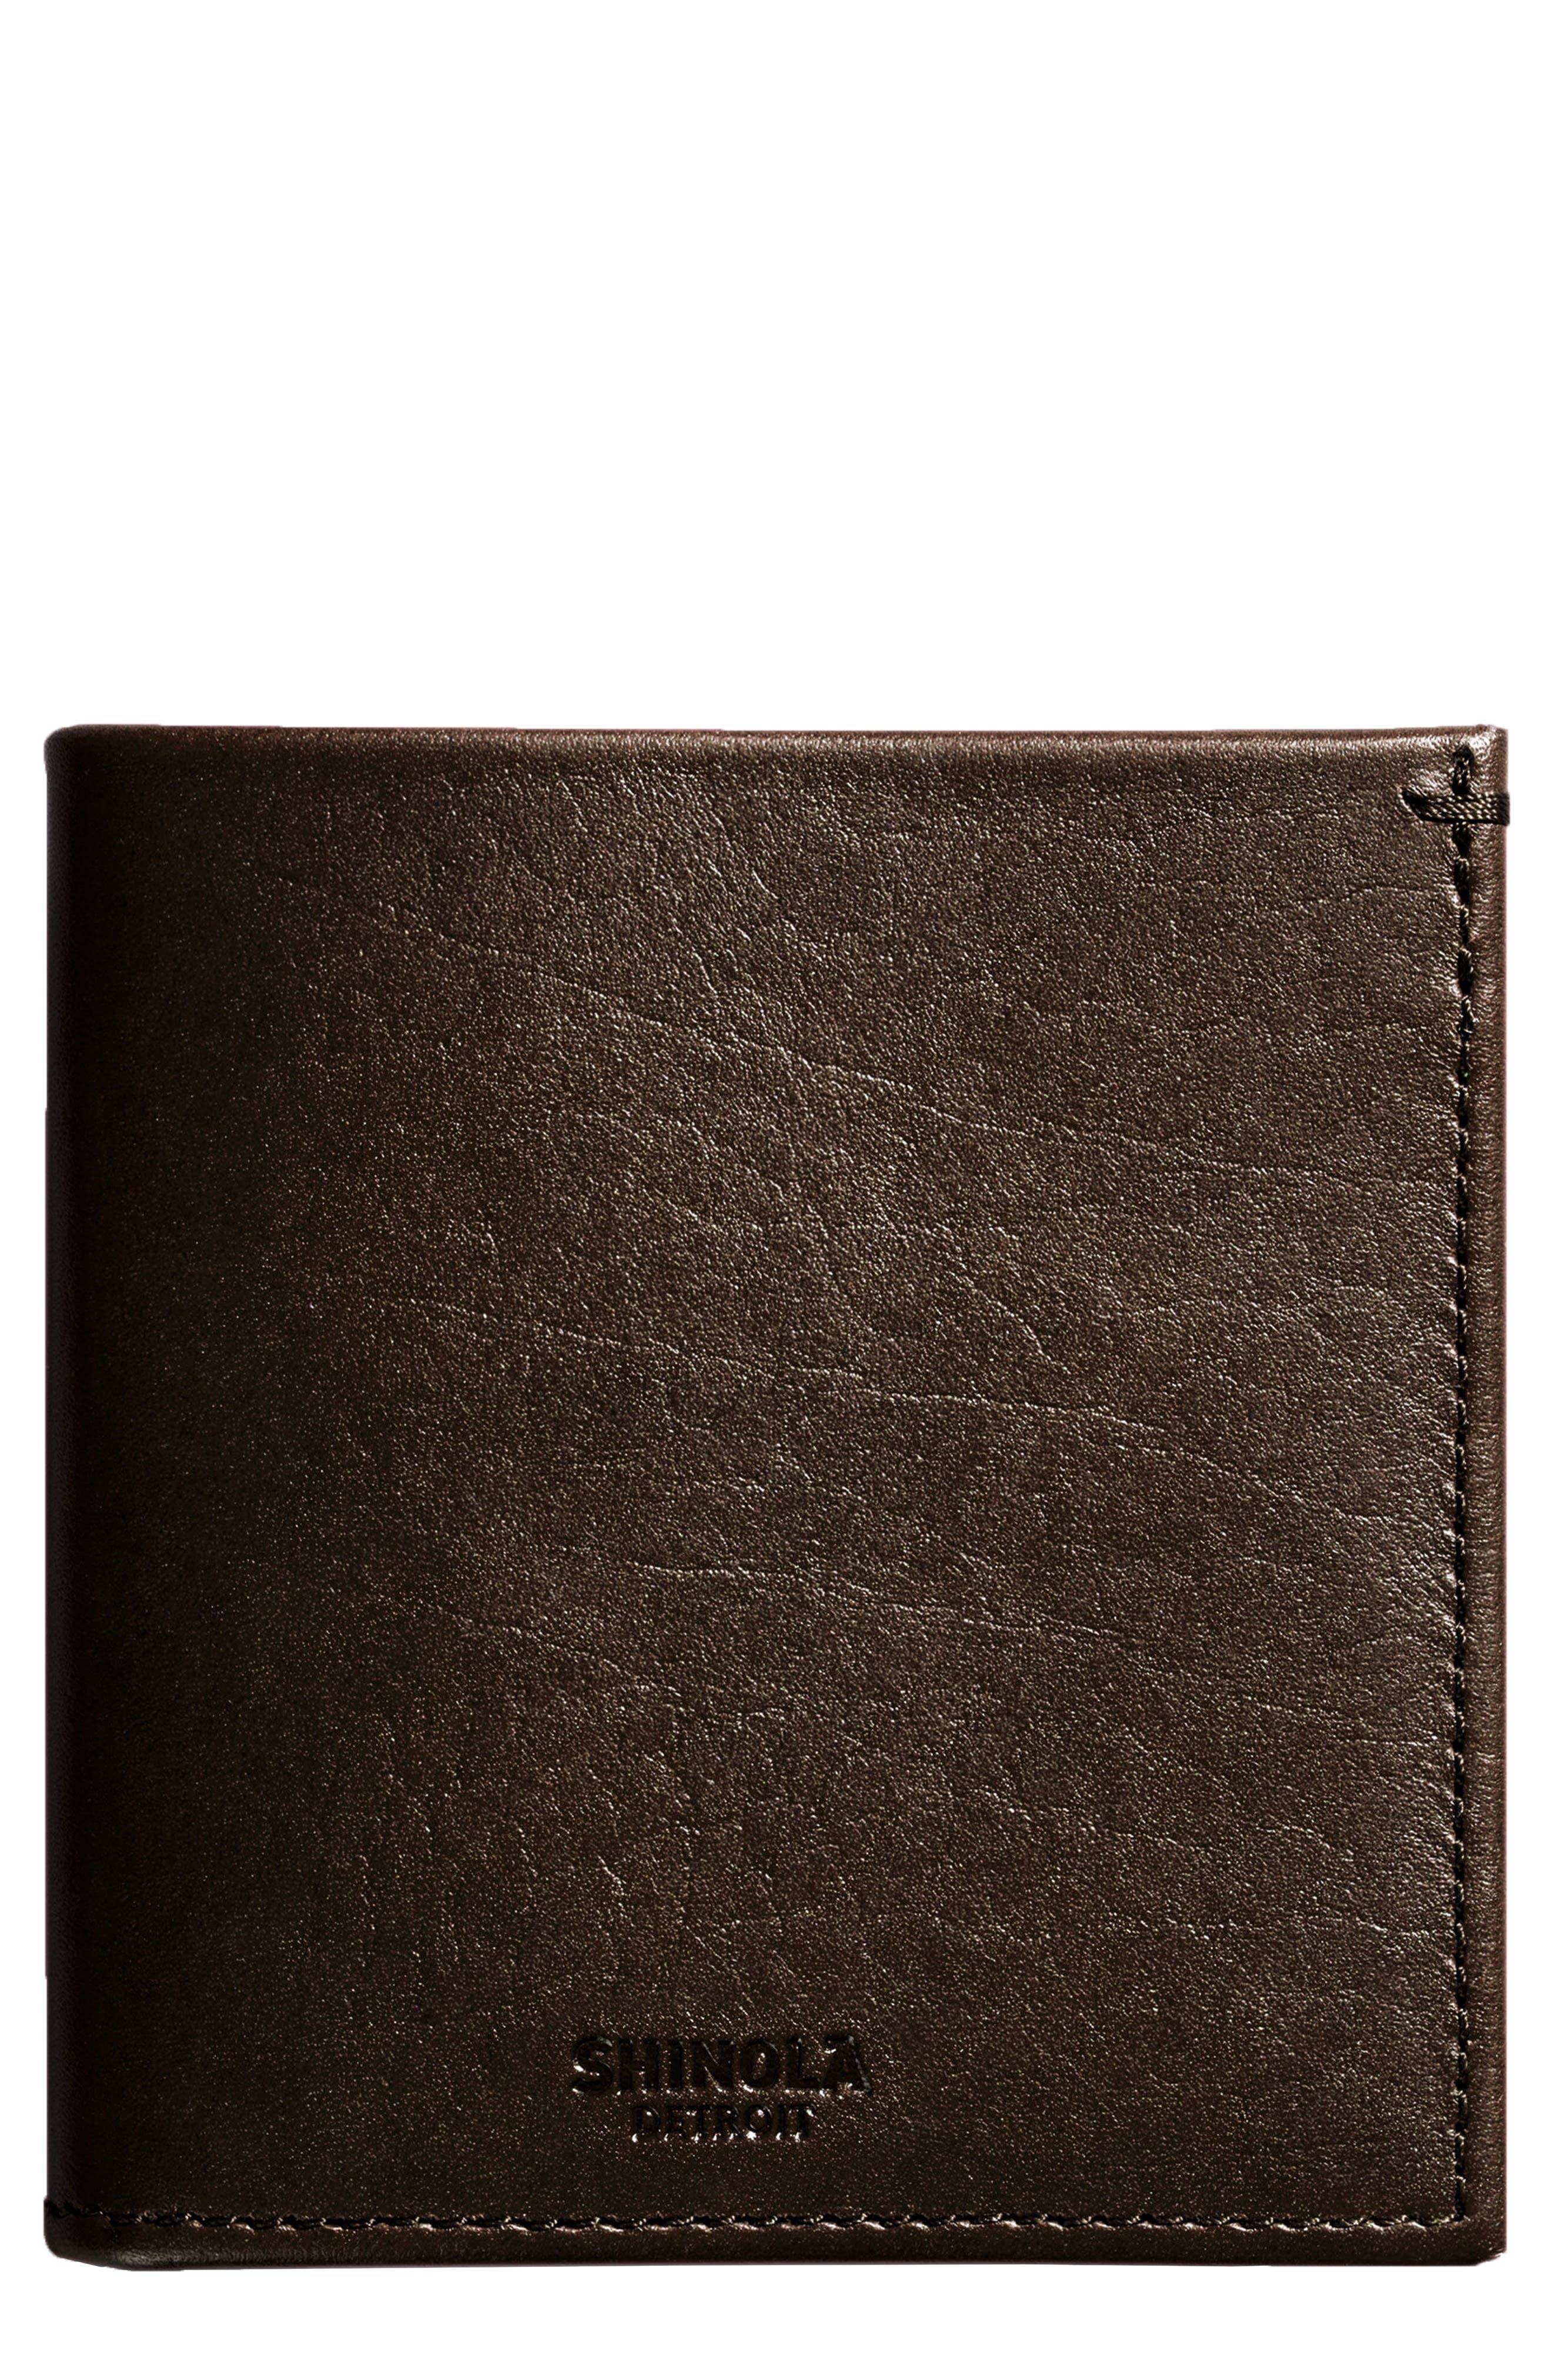 Alternate Image 1 Selected - Shinola Square Bifold Leather Wallet